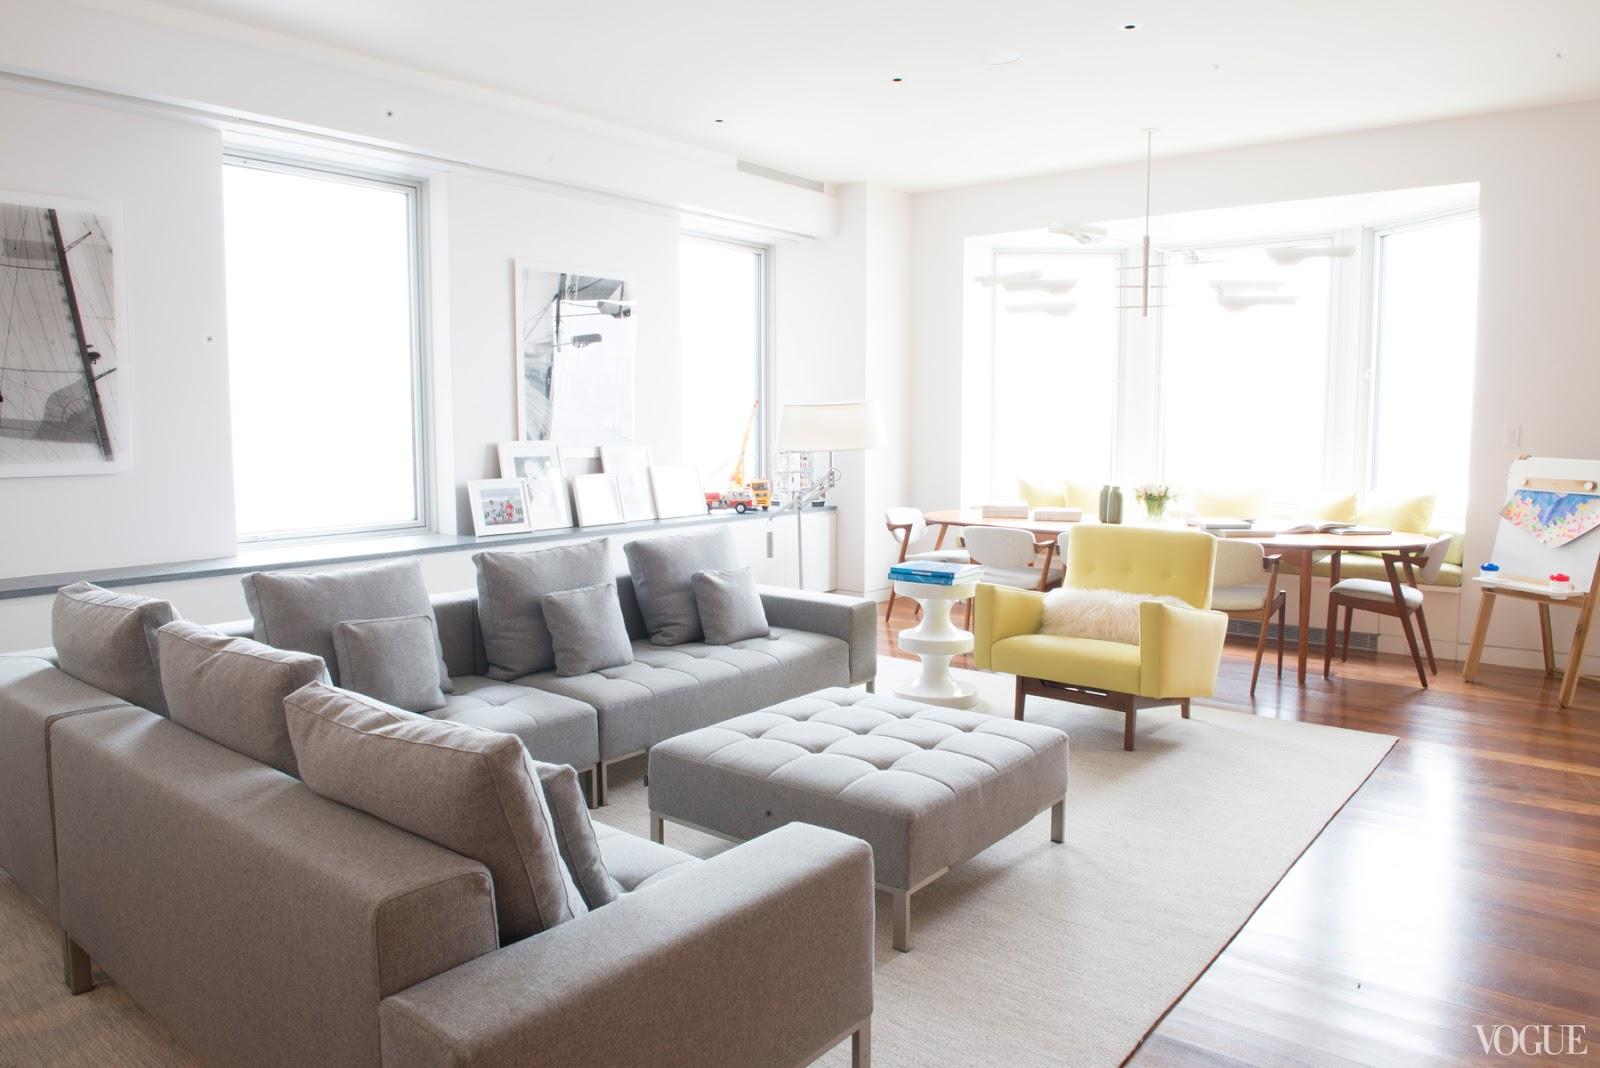 living room ideas light grey sofa armchair bed single gray leather interior design modern